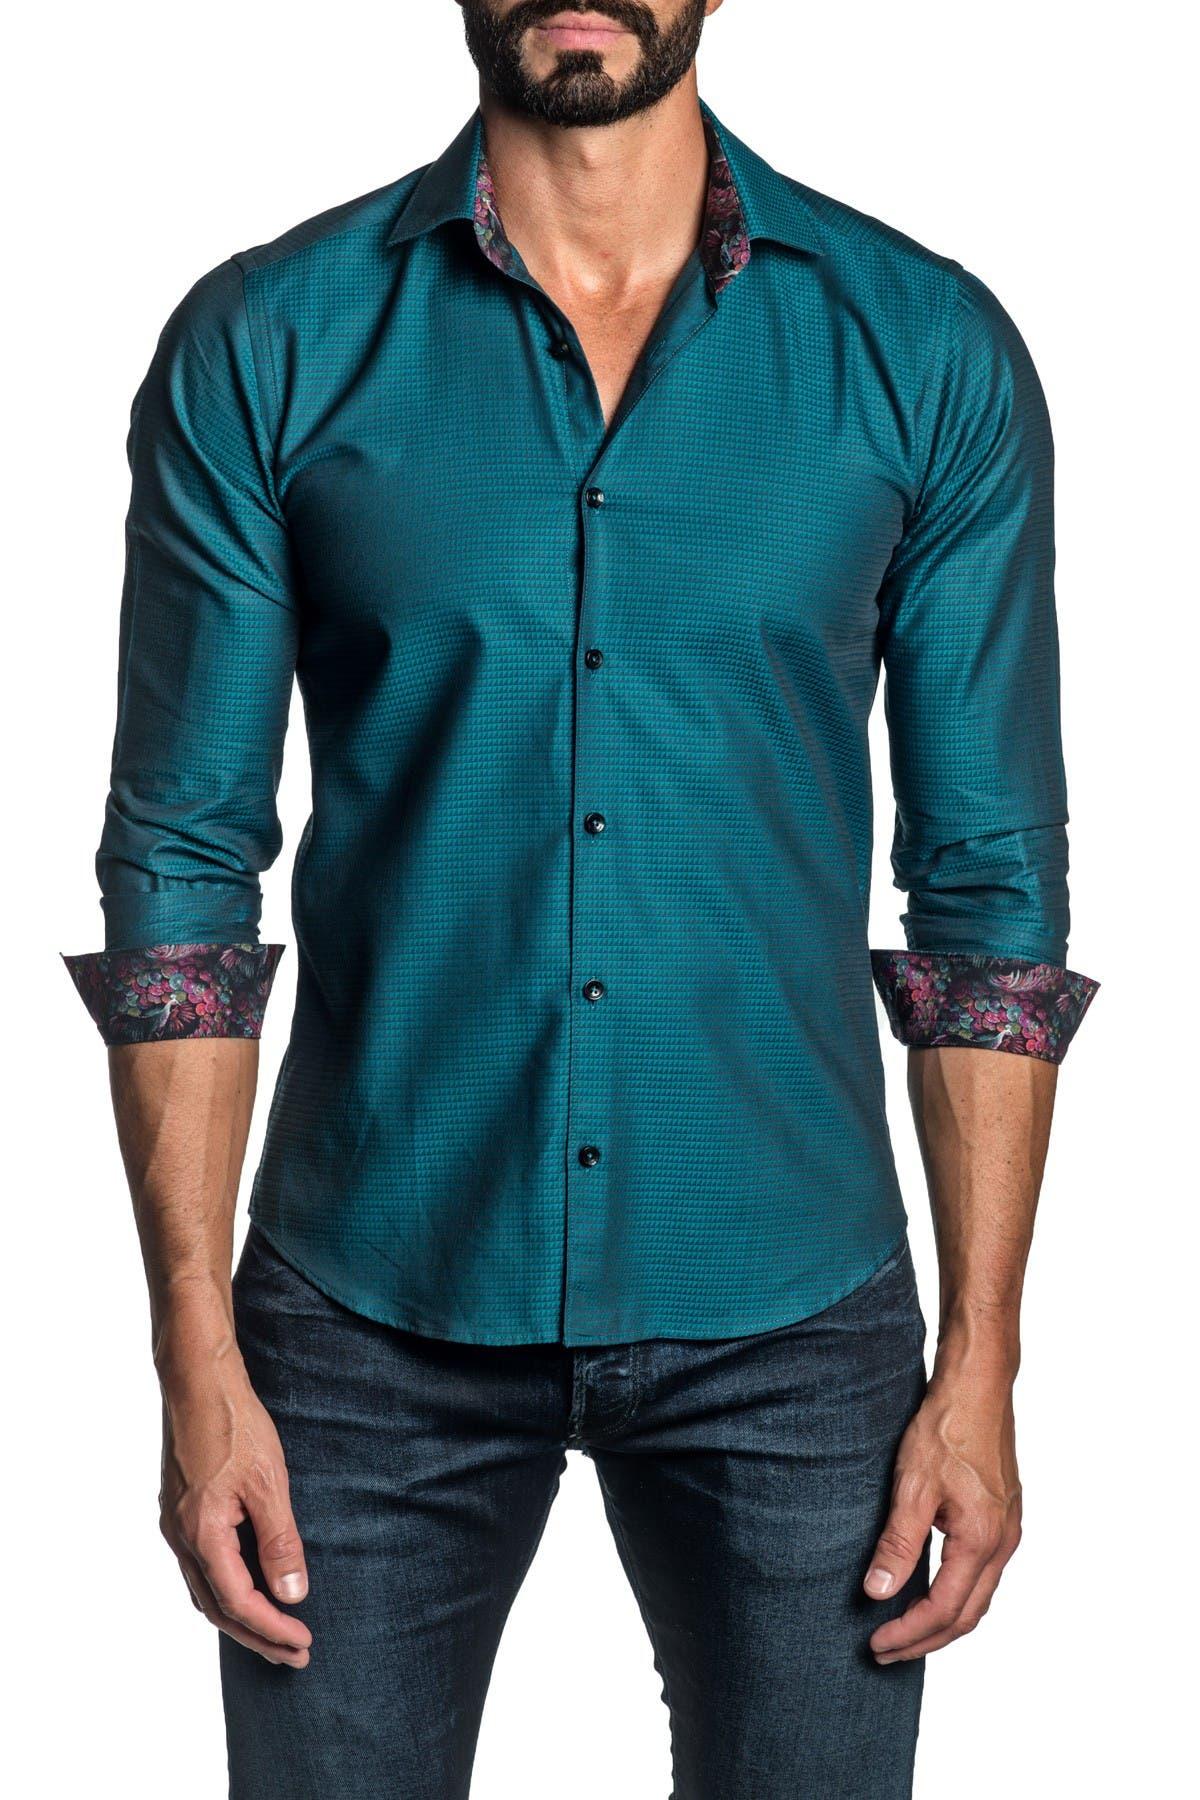 Jared Lang TRIM FIT GREEN TEAL JACQUARD DRESS SHIRT